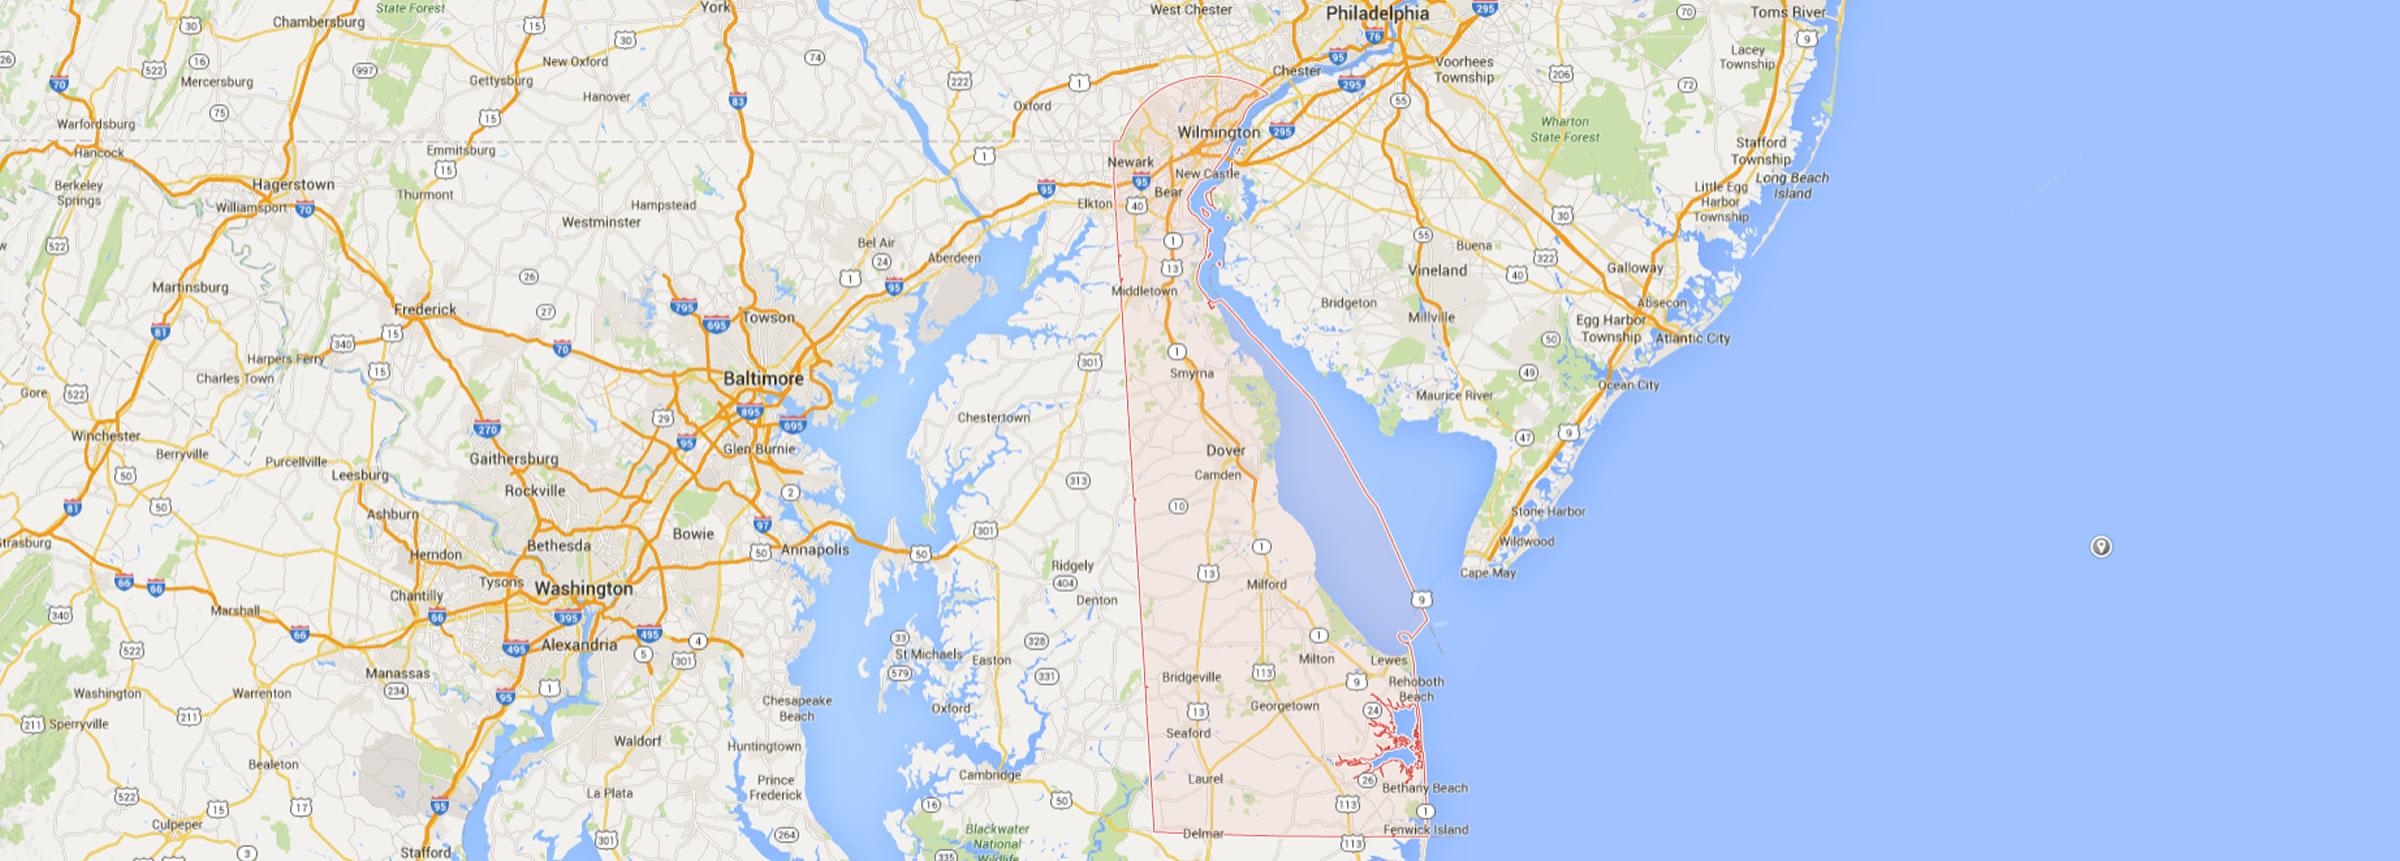 delaware-map